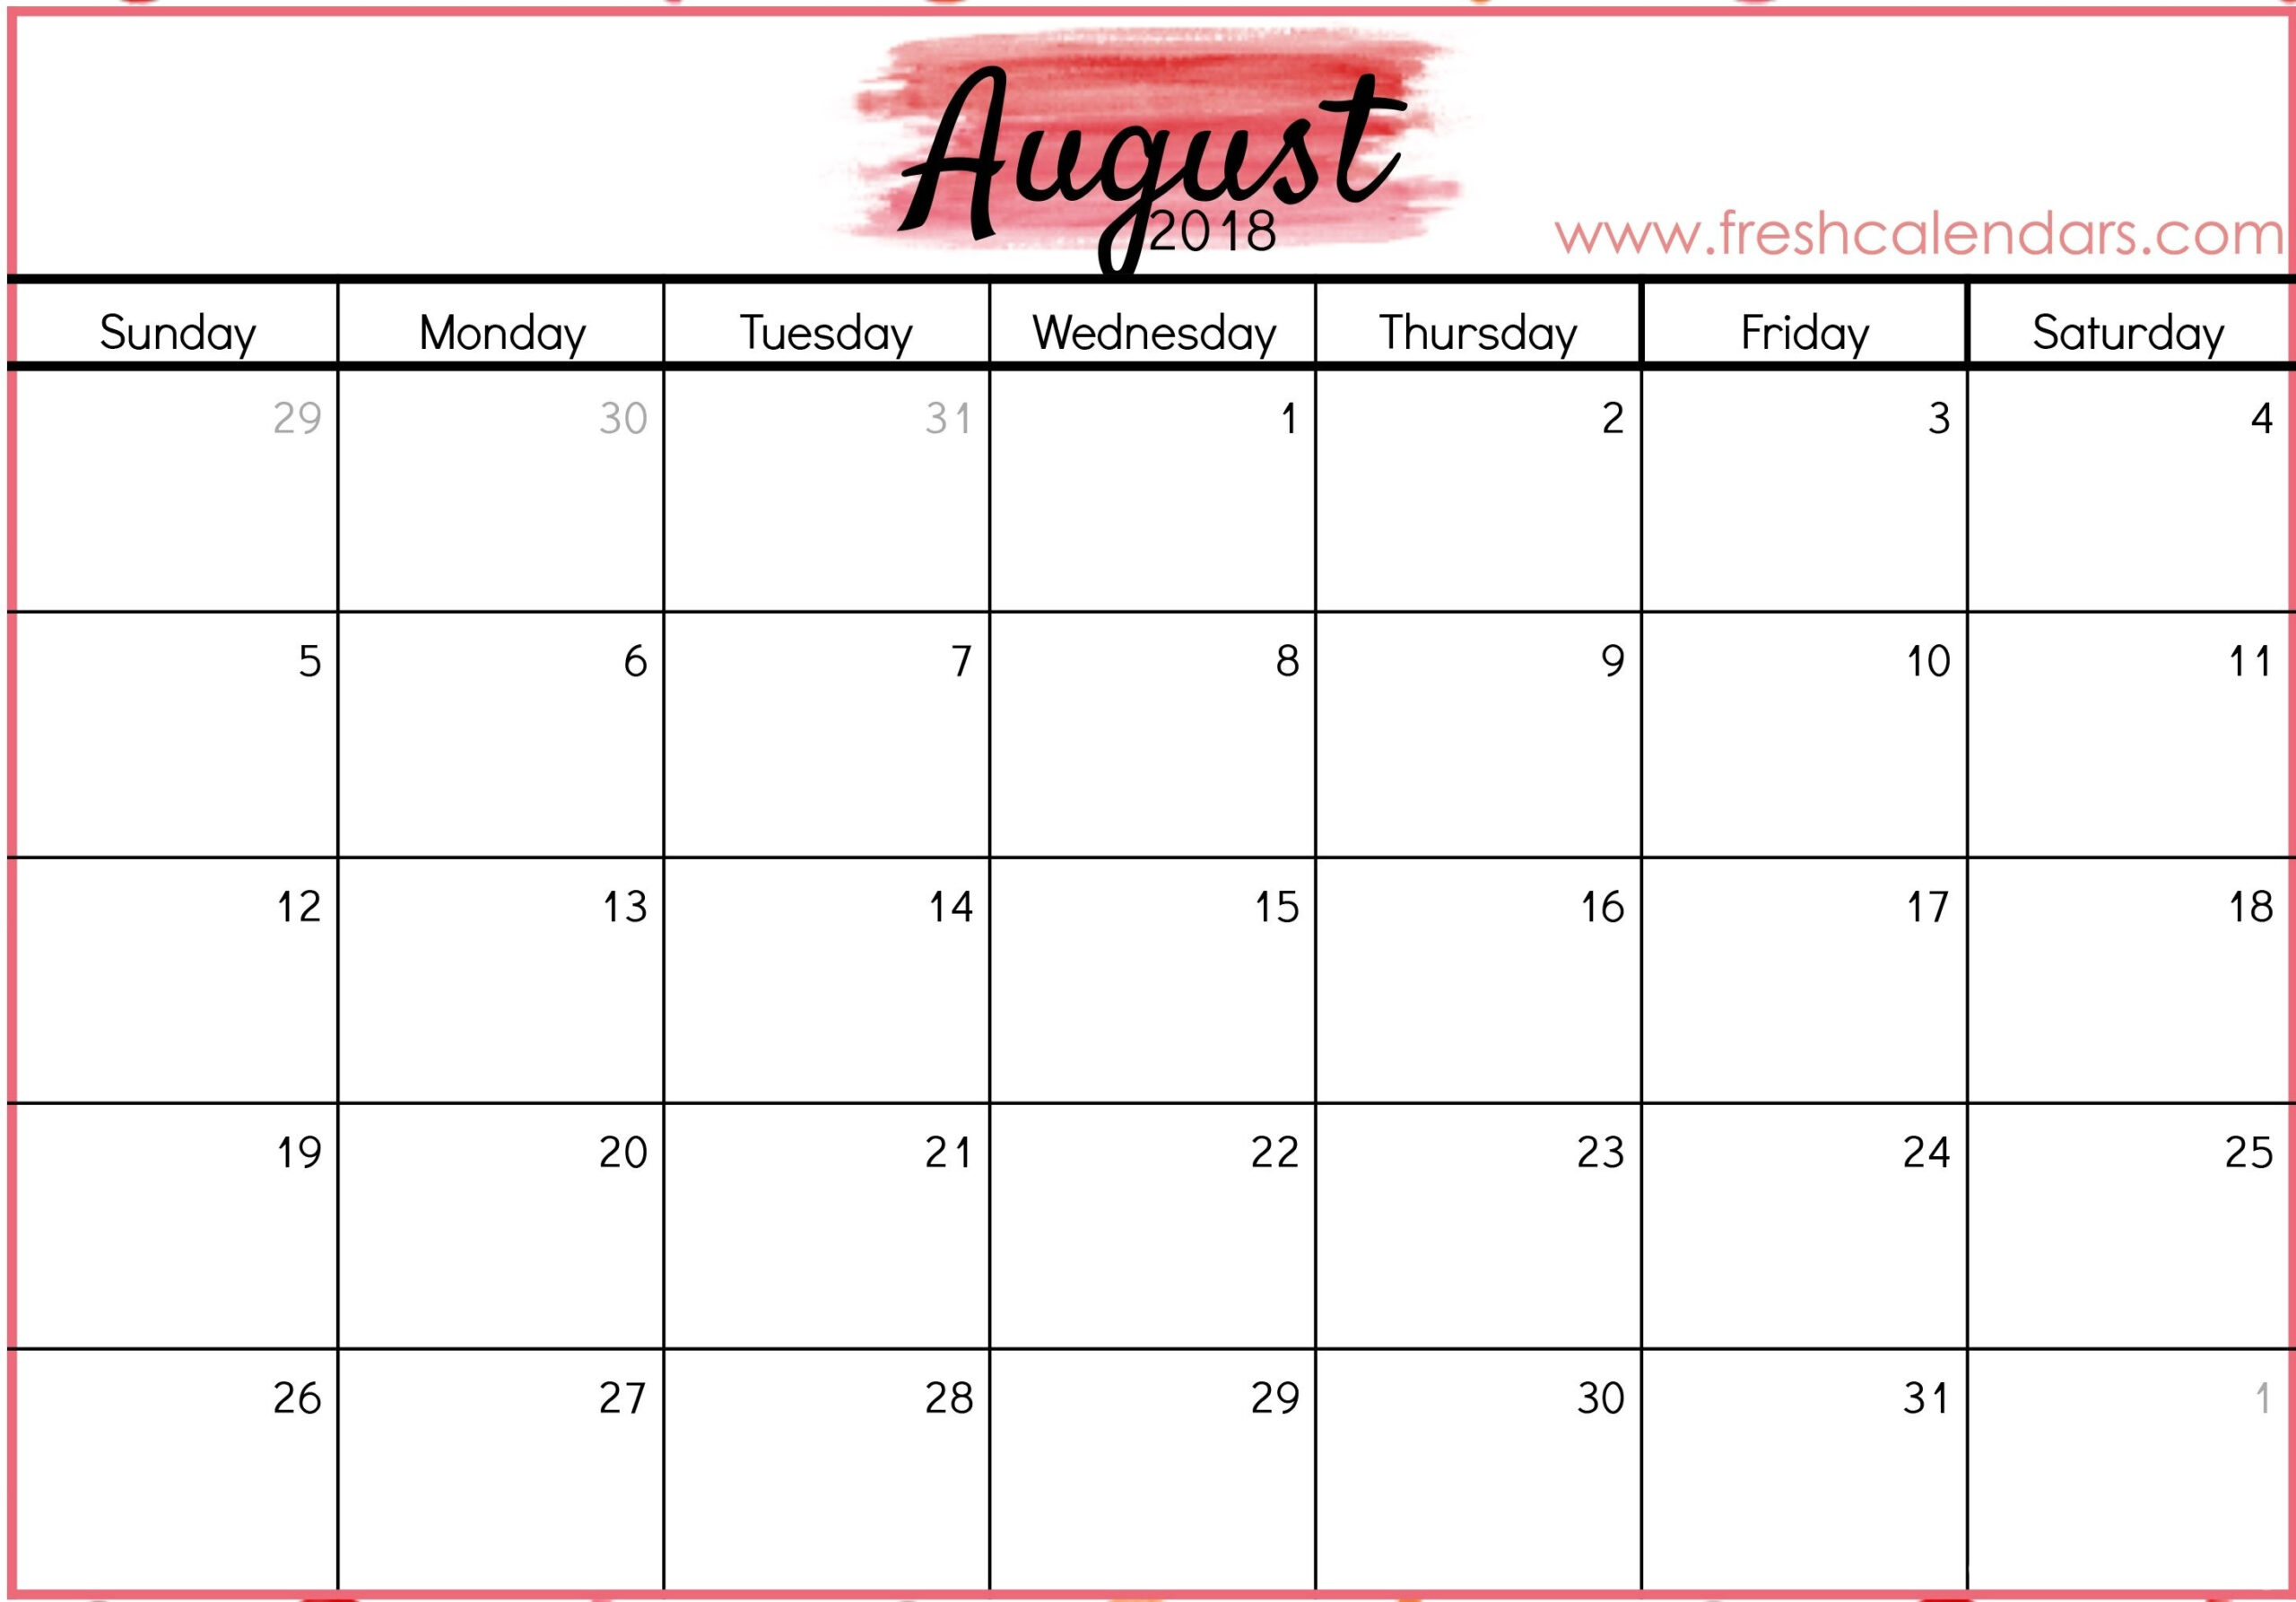 Print Calendar Specific Dates In 2020 | August Calendar